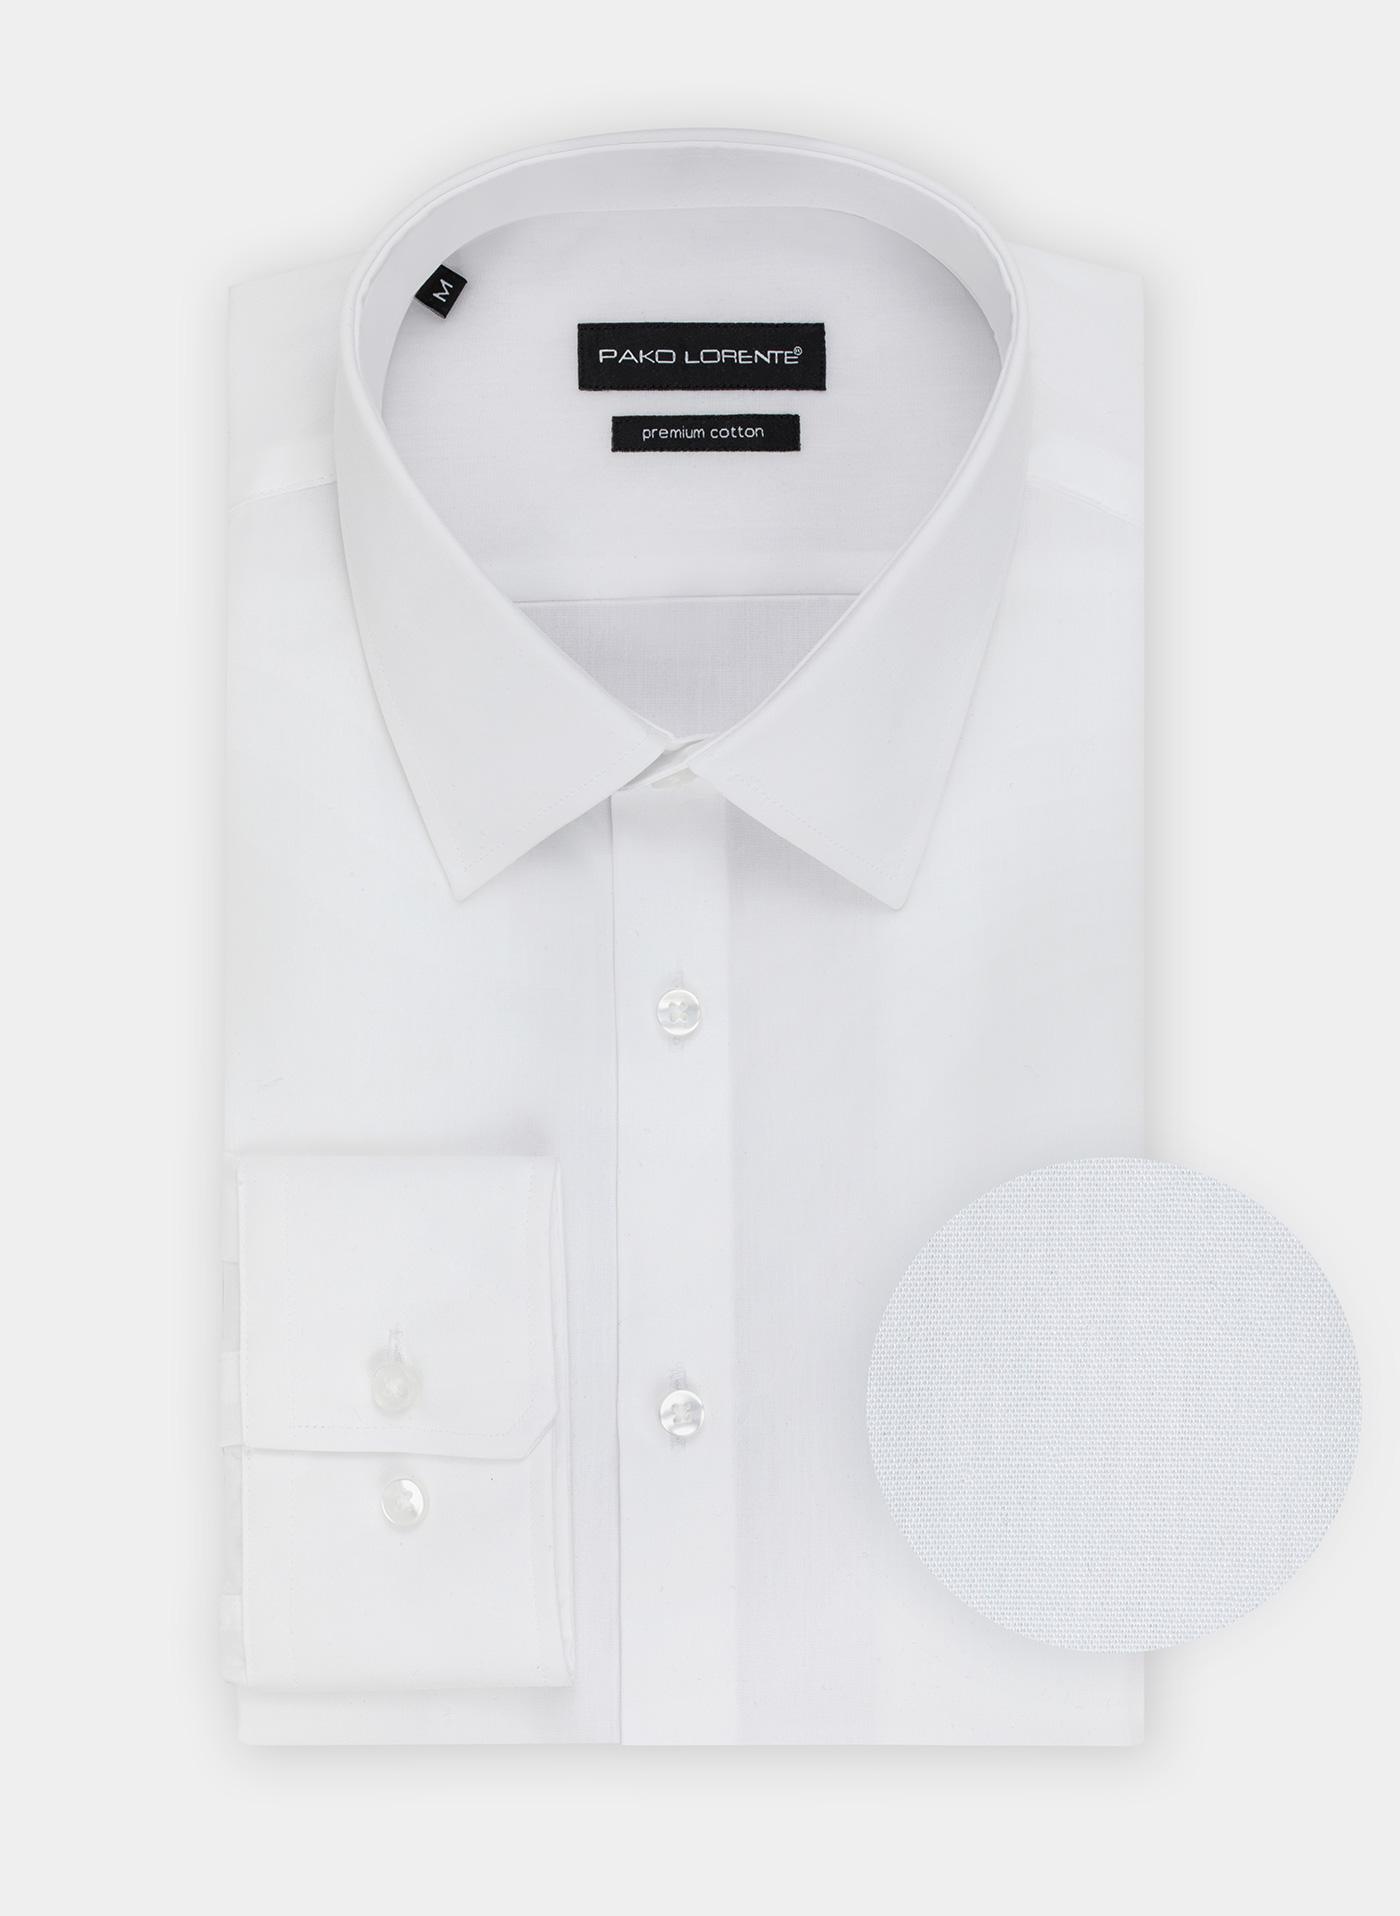 4a25a40e1bd12d Biała koszula 100% bawełny męska elegancka i biznesowa